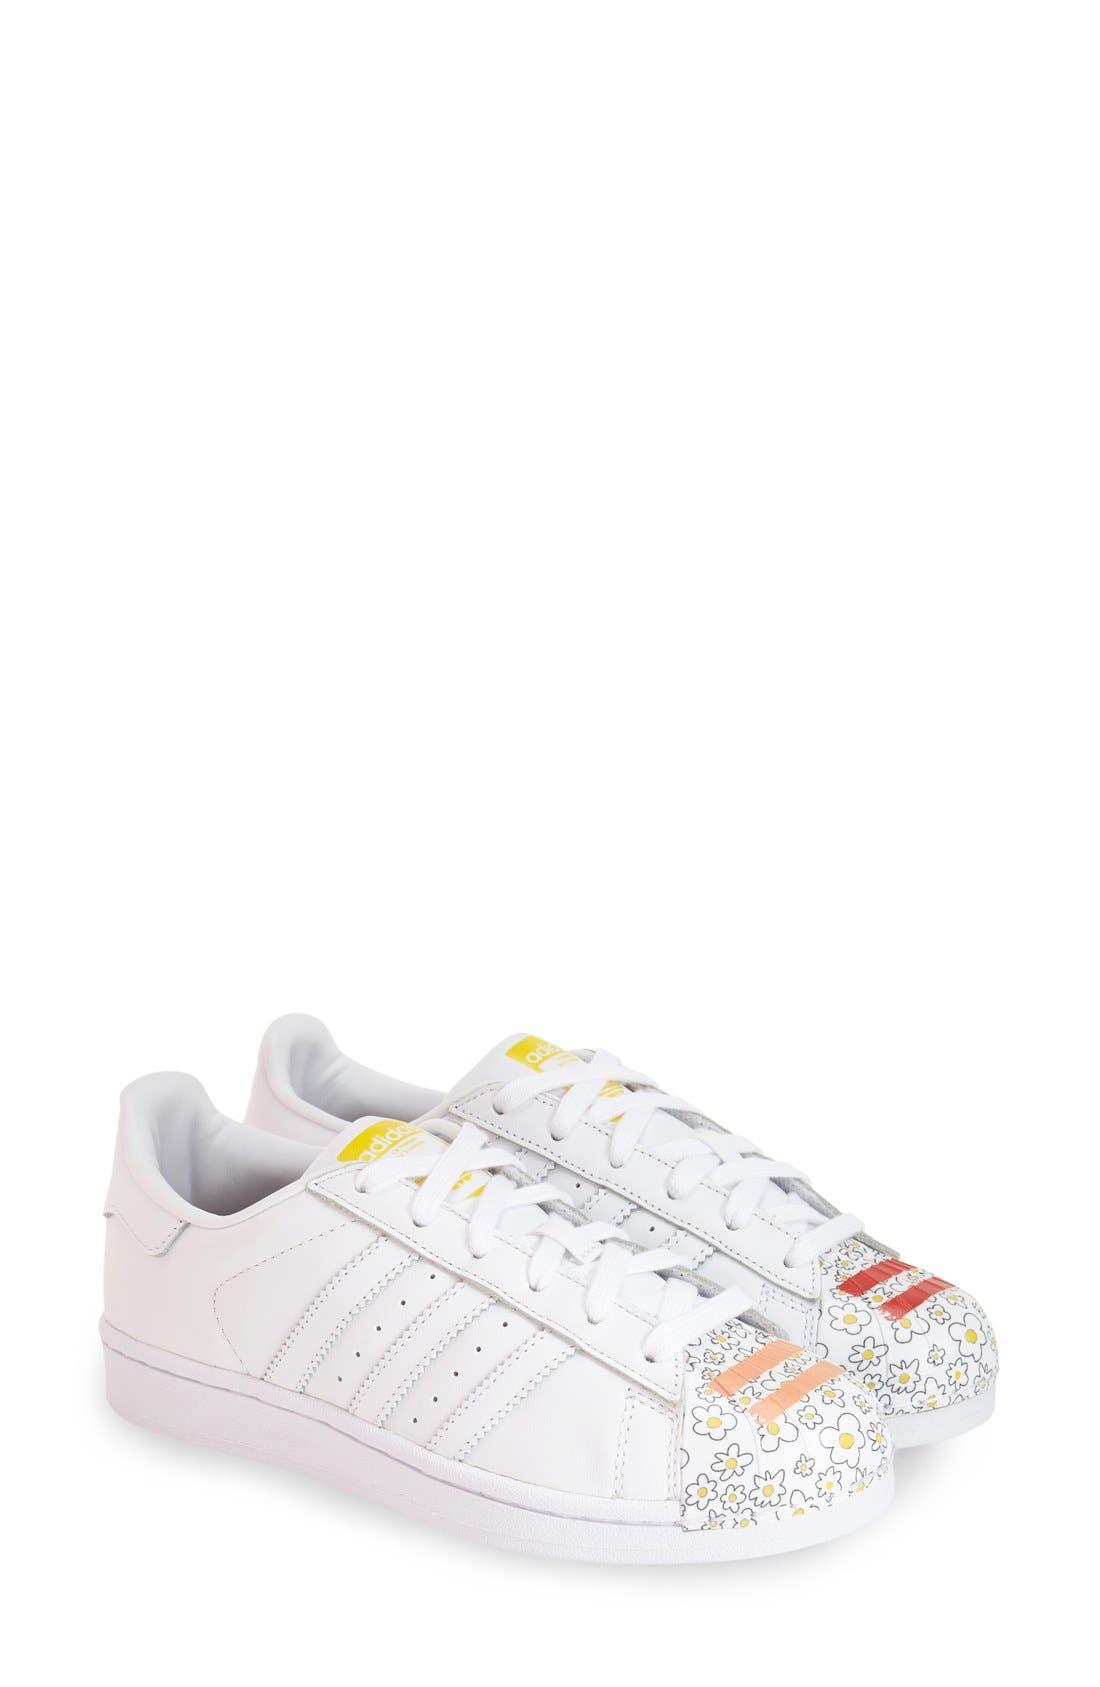 Main Image - adidas 'Superstar Pharrell Supershell' Sneaker